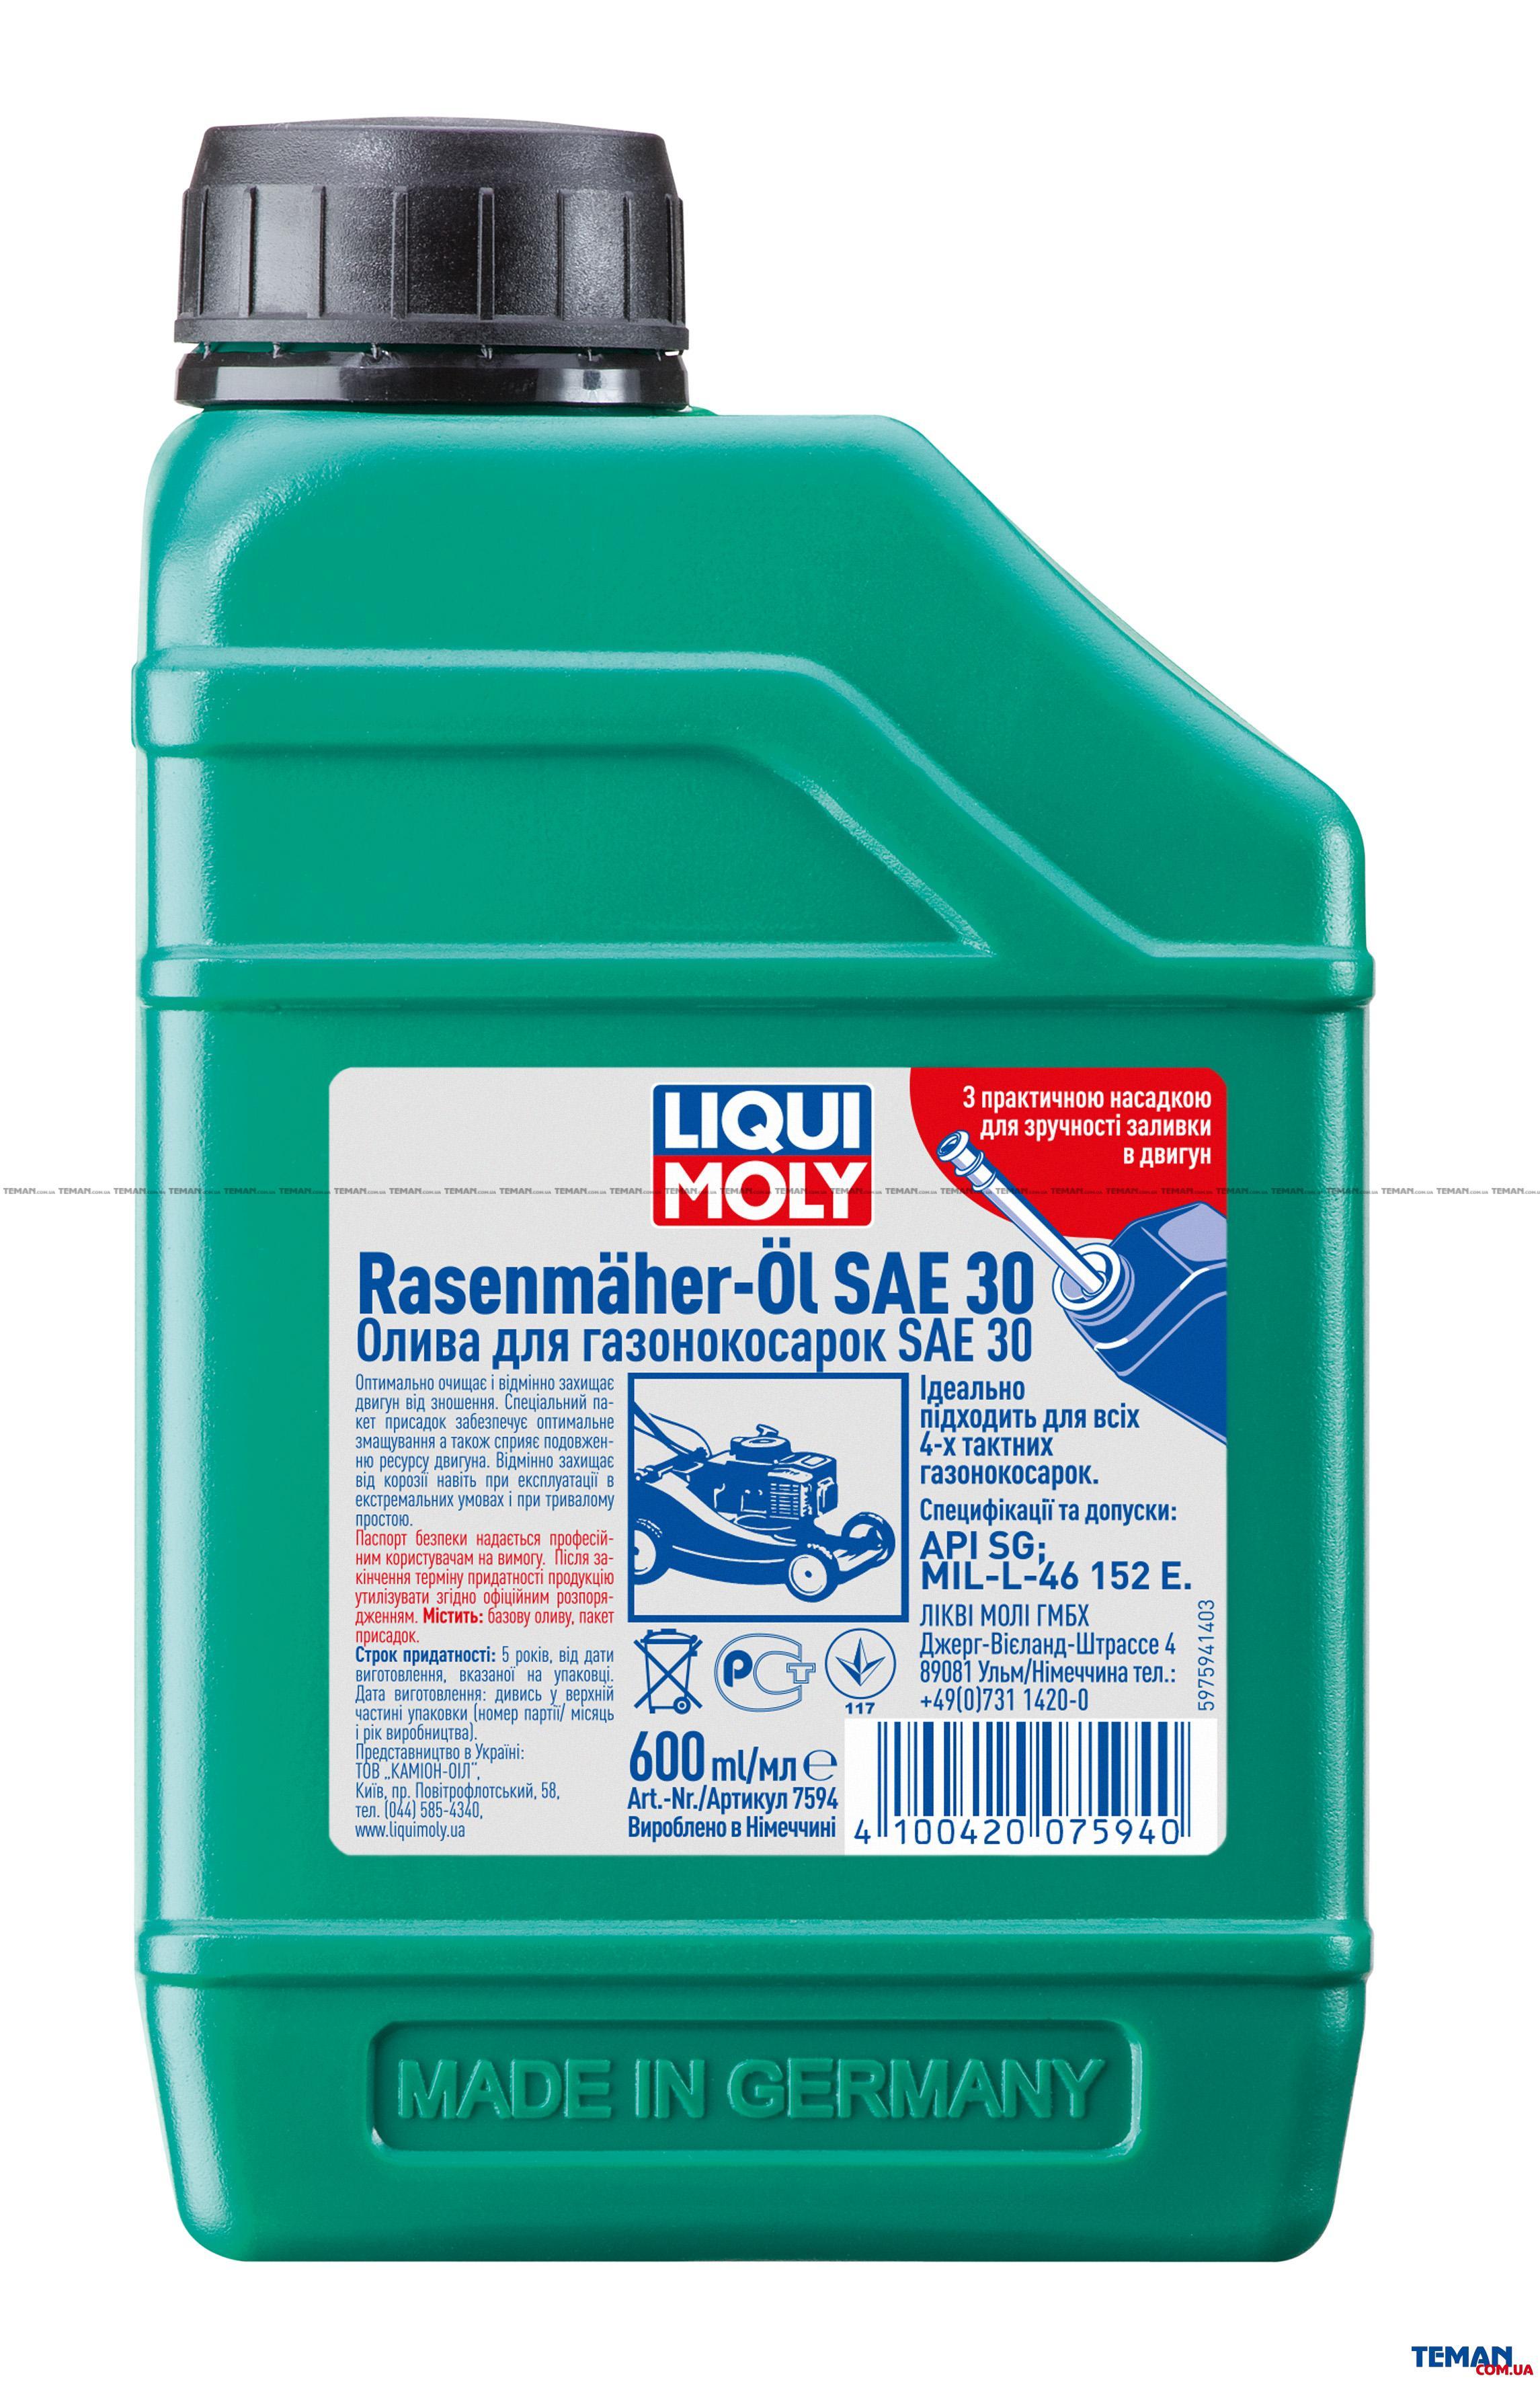 Масло Для Газонокосилок - Rasenmuher-Oil SAE HD 30, 600 мл